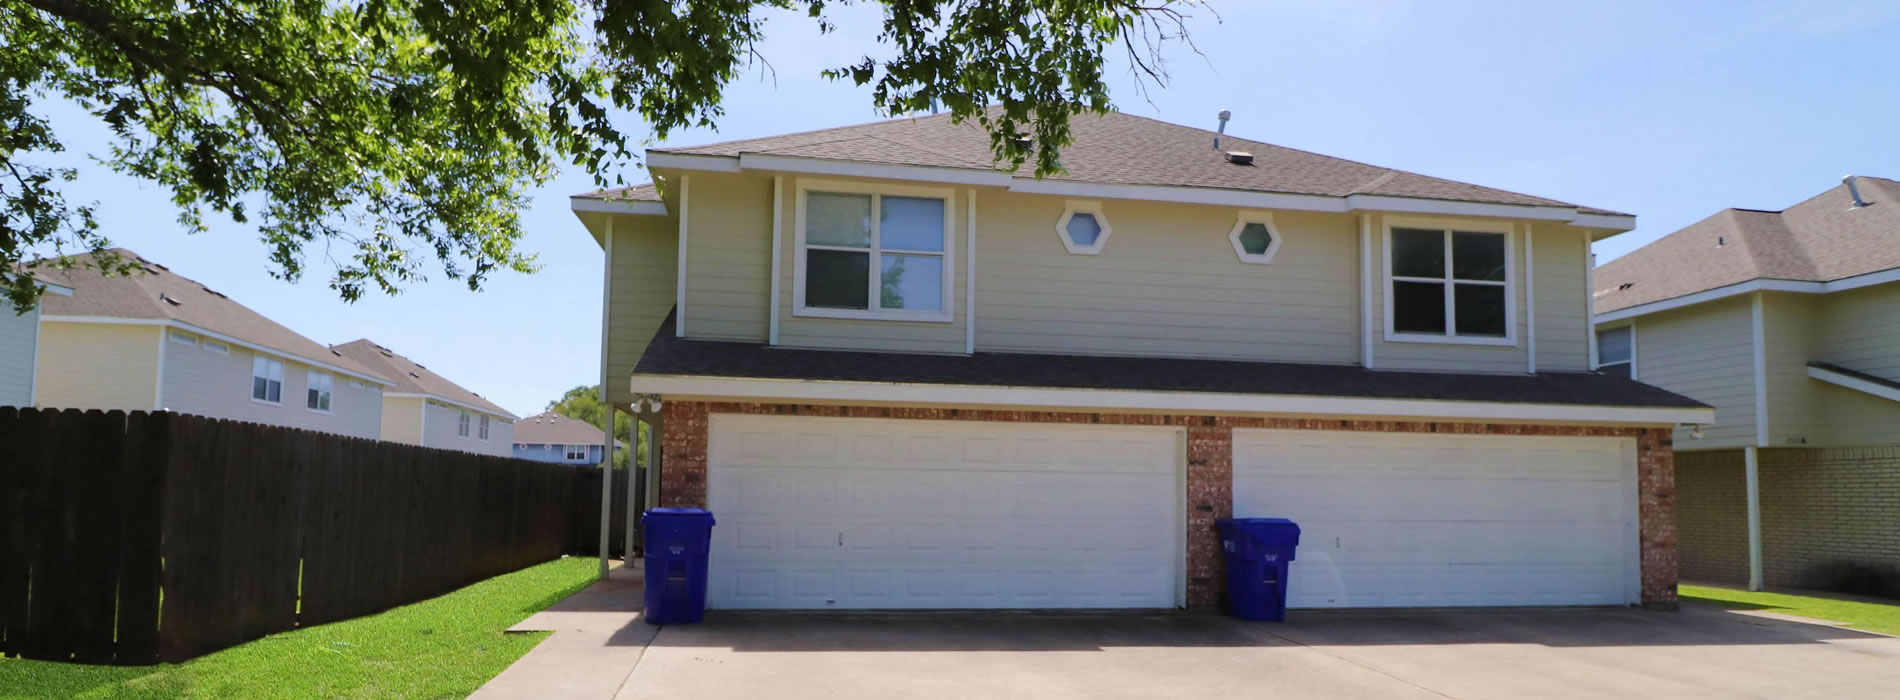 University Woods Apartments Waco Tx 254 235 8343